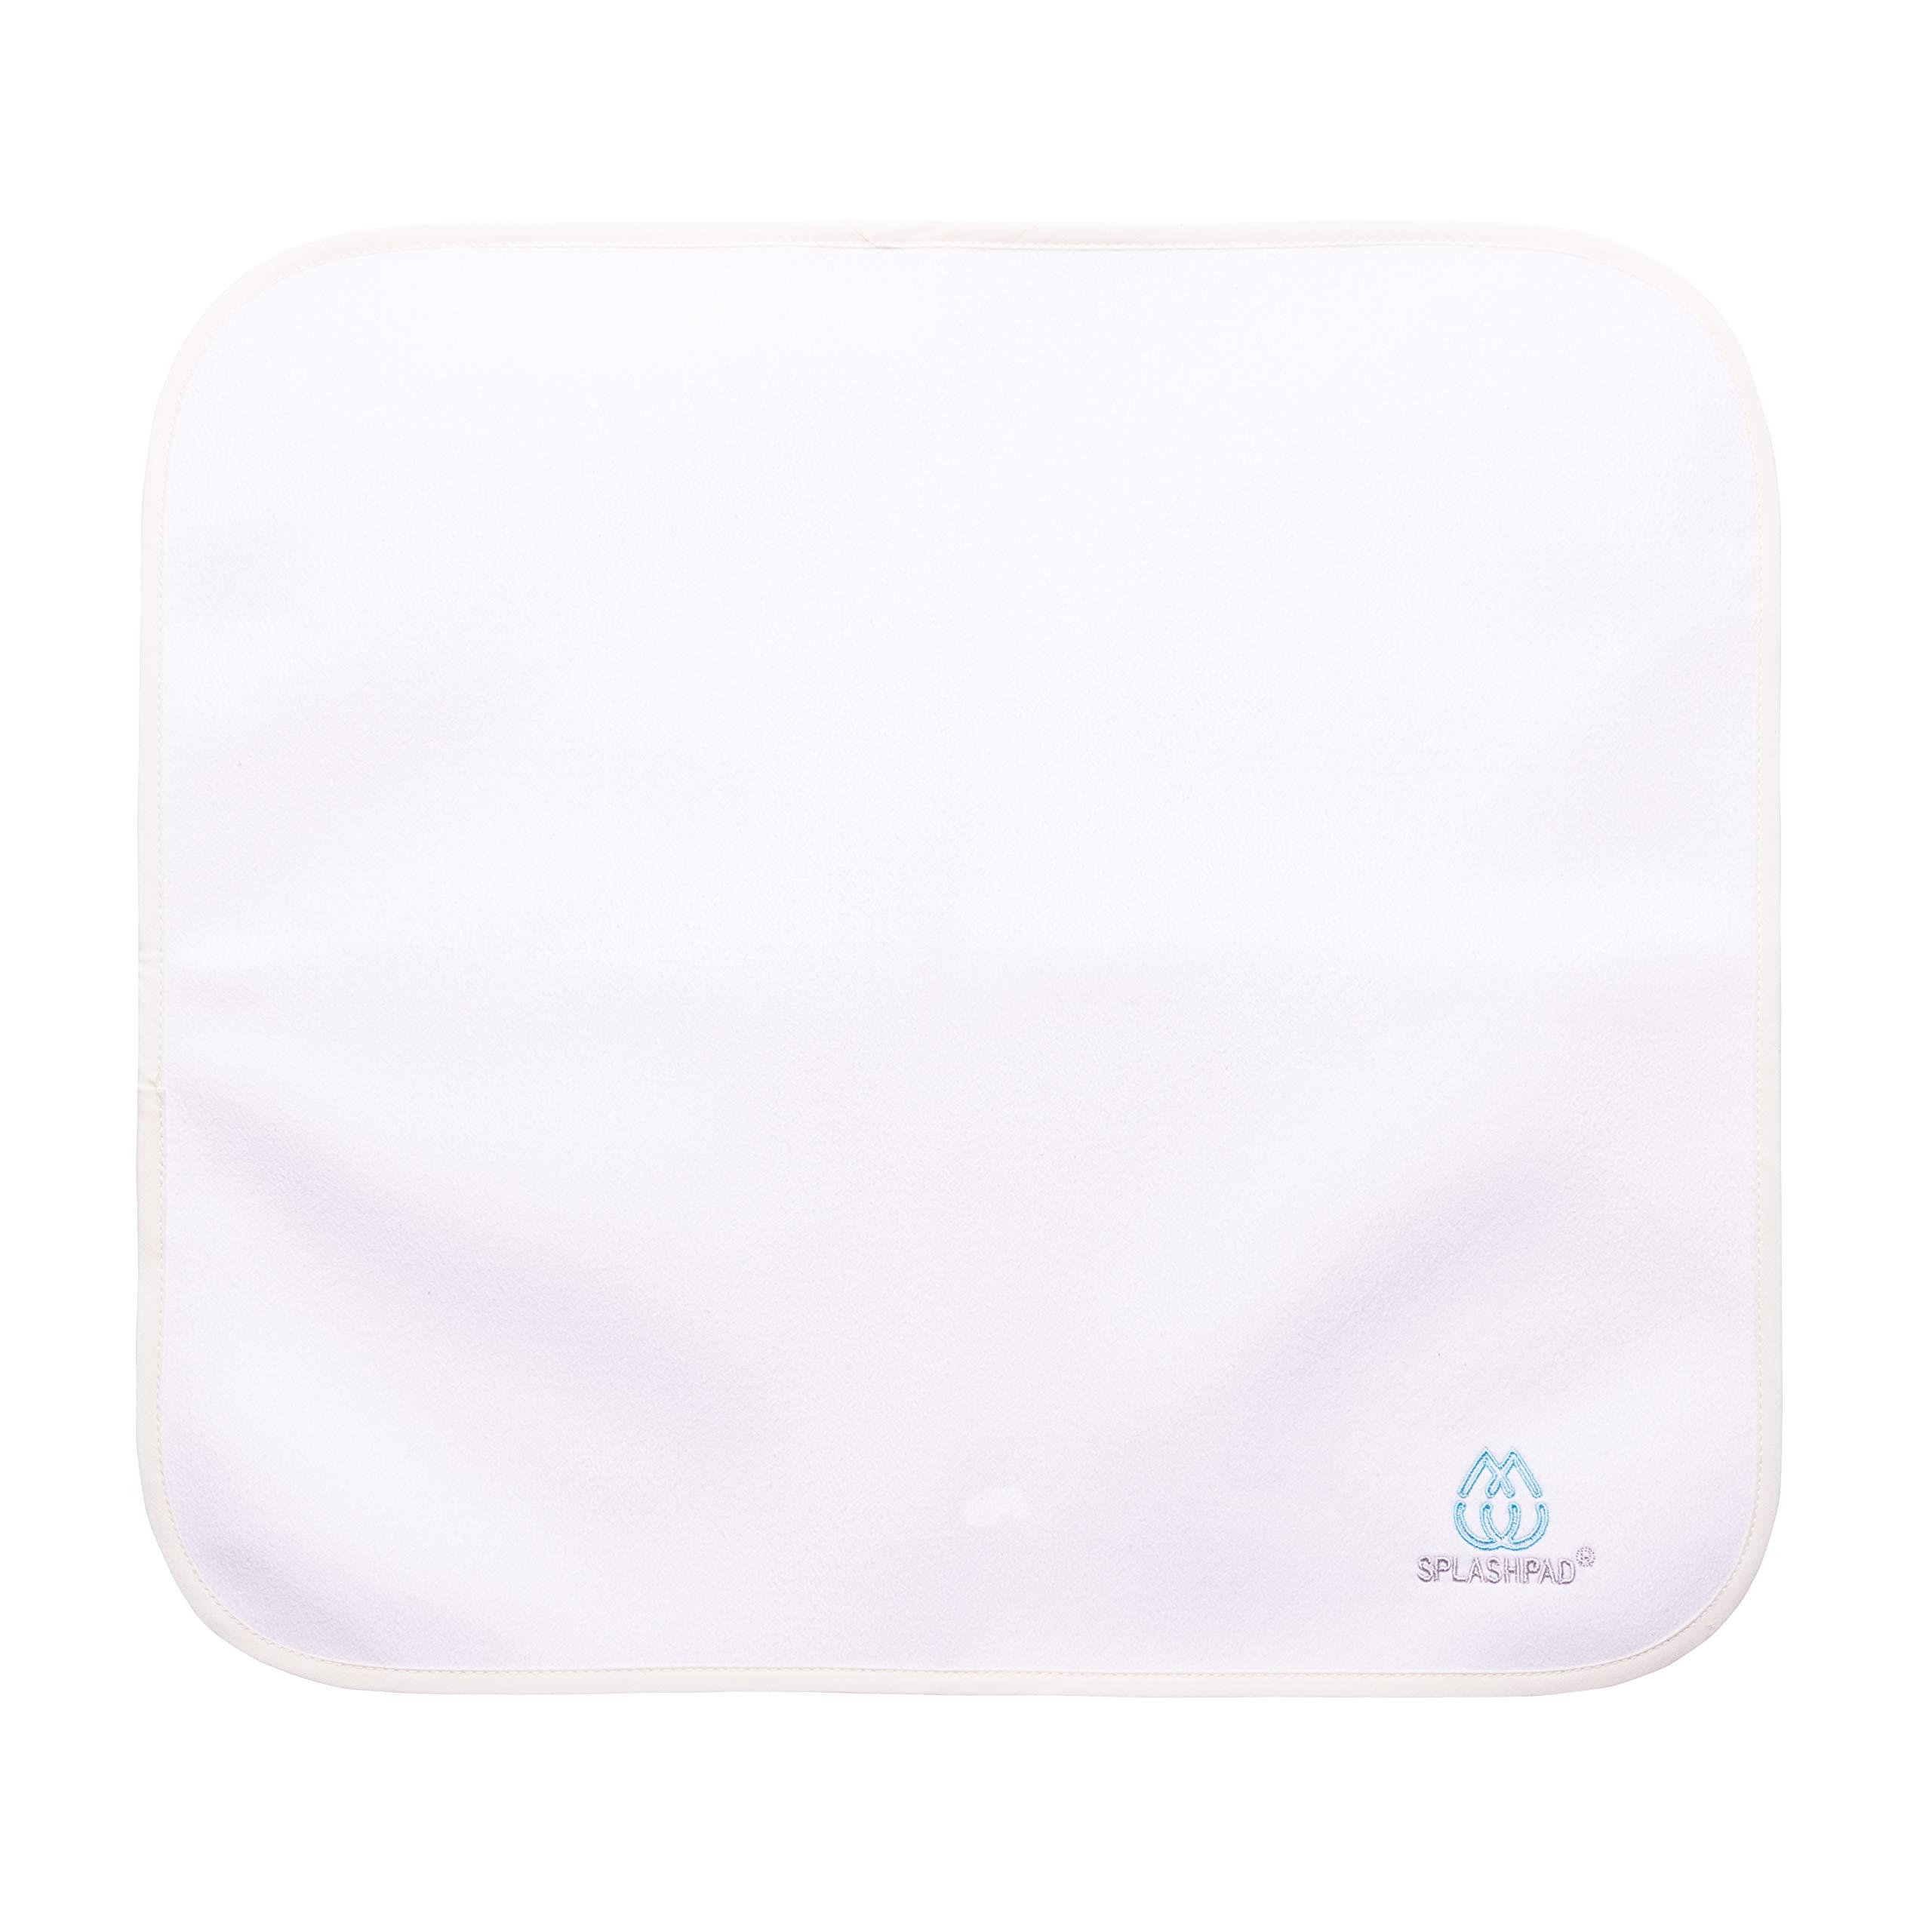 SPLASHPAD Baby - Diaper Changing Mat (16x18 Mat Solid White)